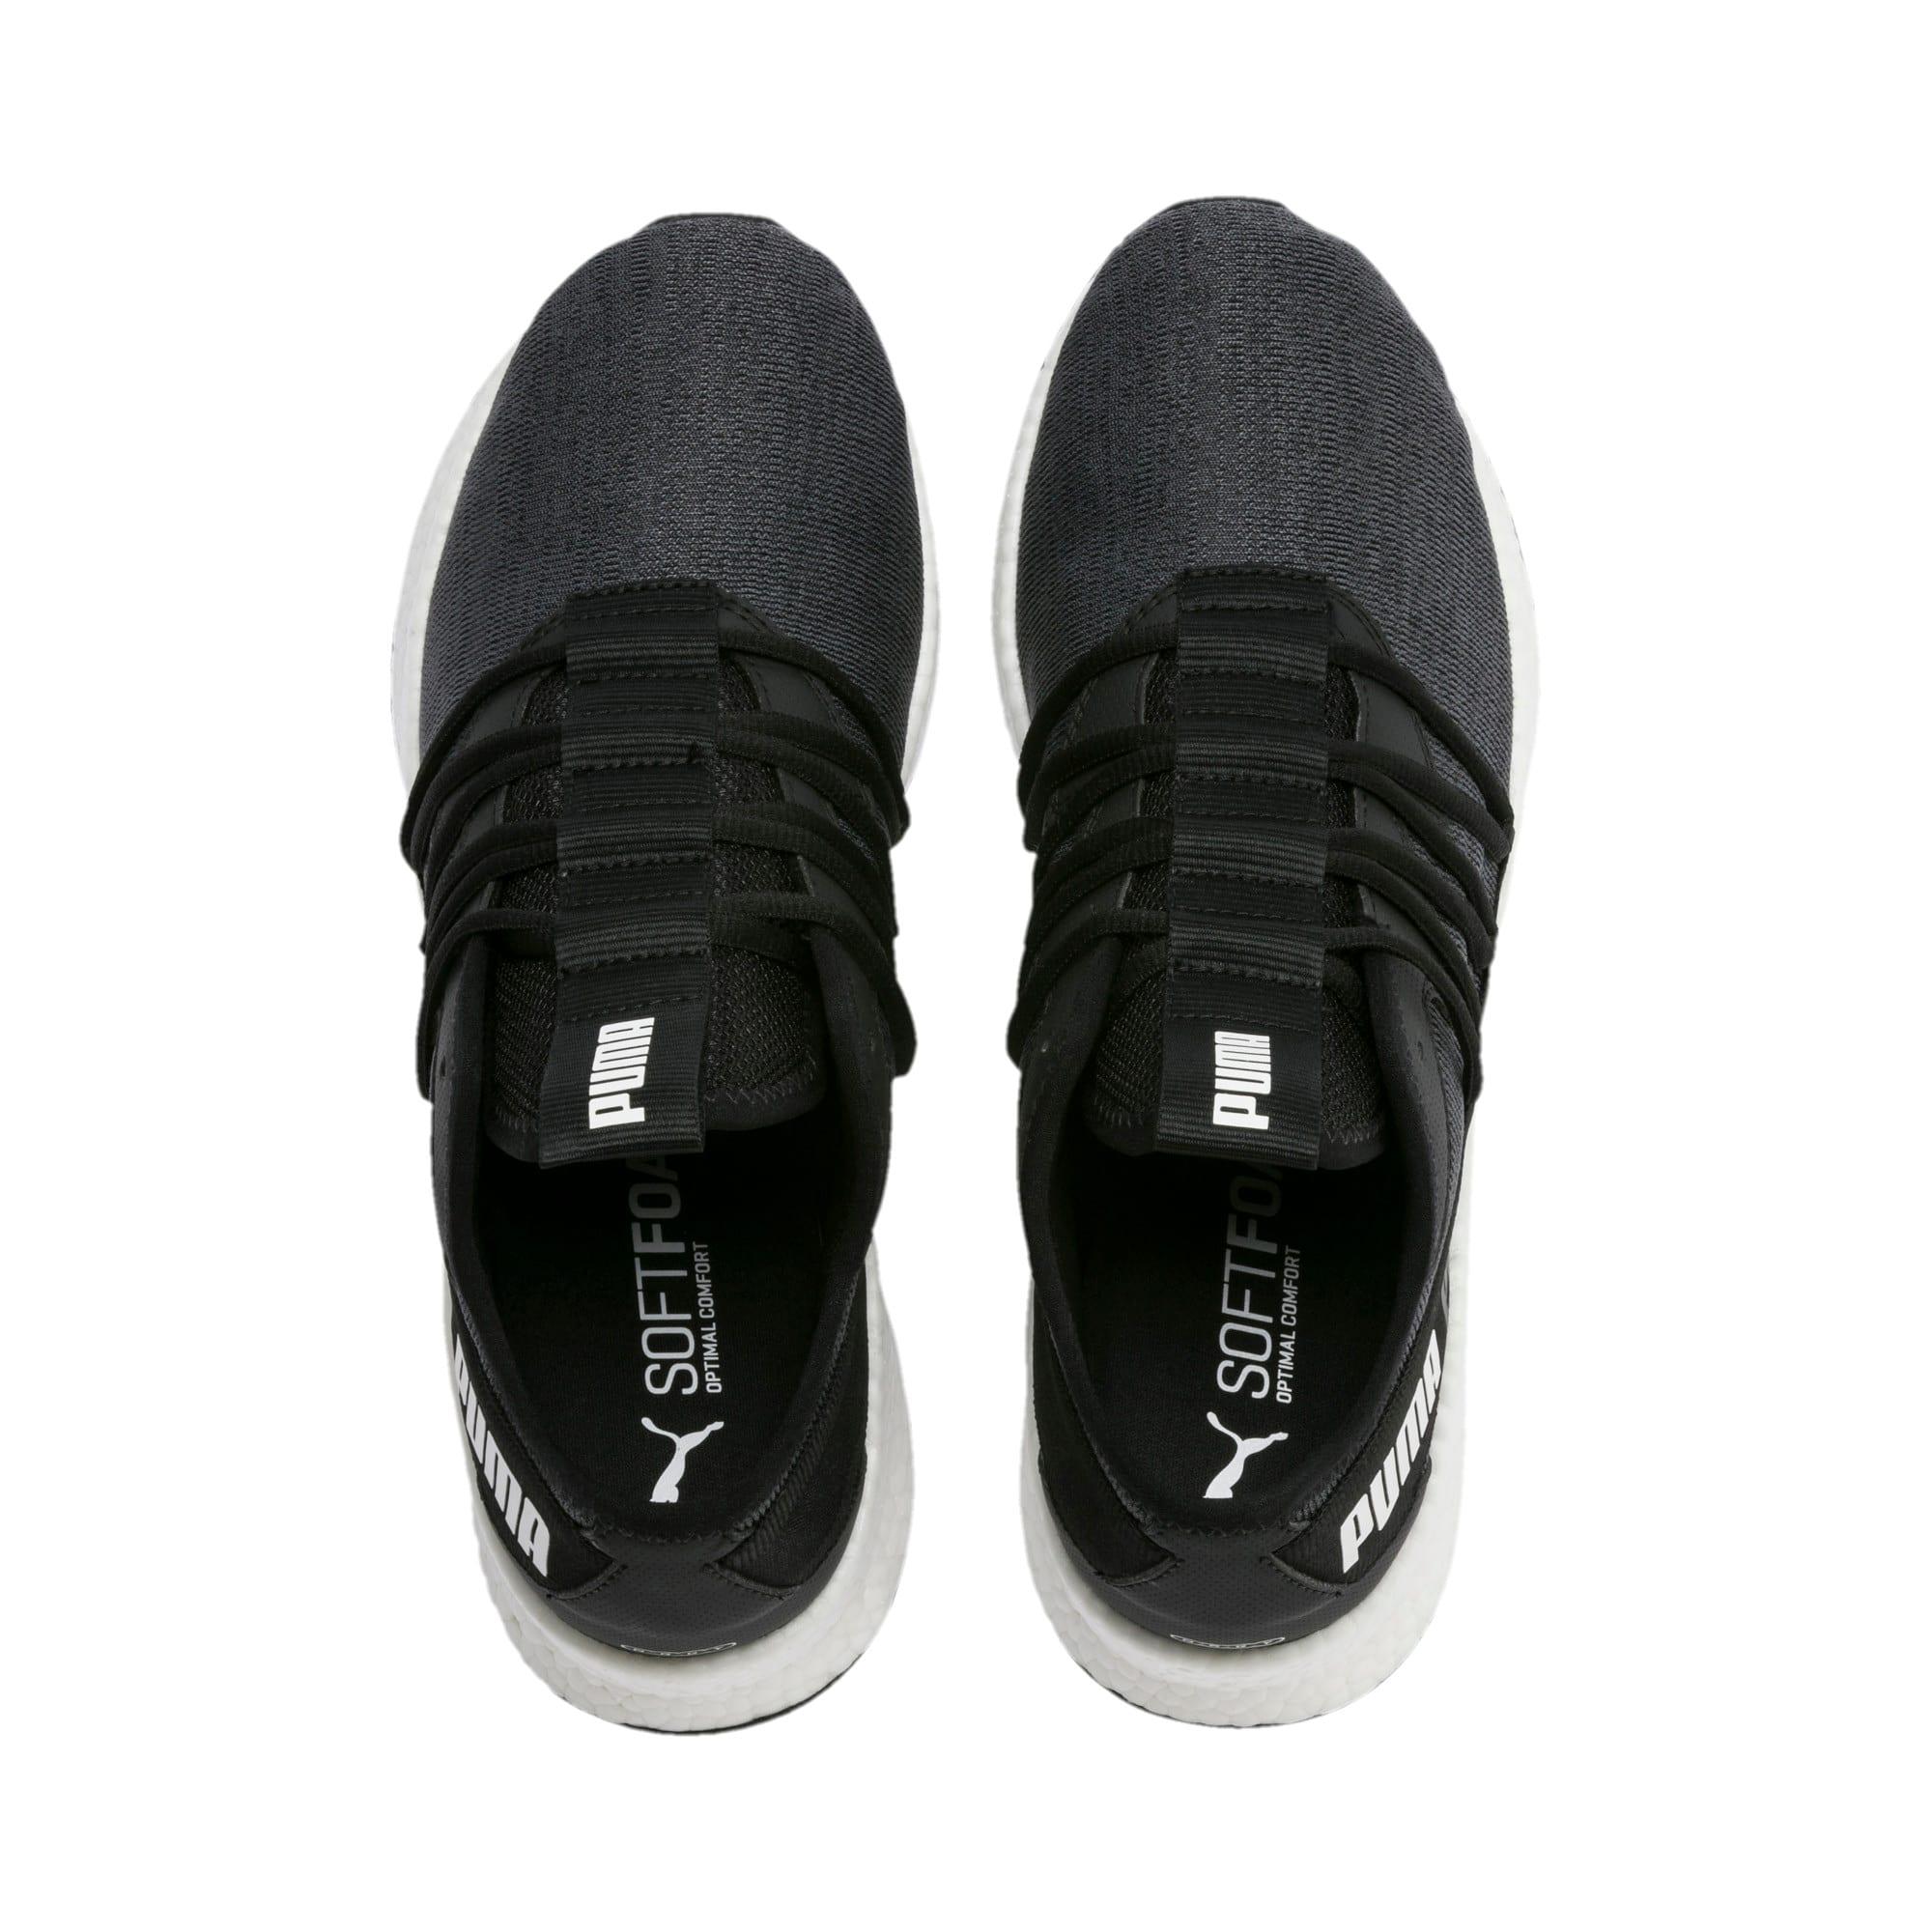 Thumbnail 7 of NRGY Star Knit Running Shoes, Puma Black-Puma White, medium